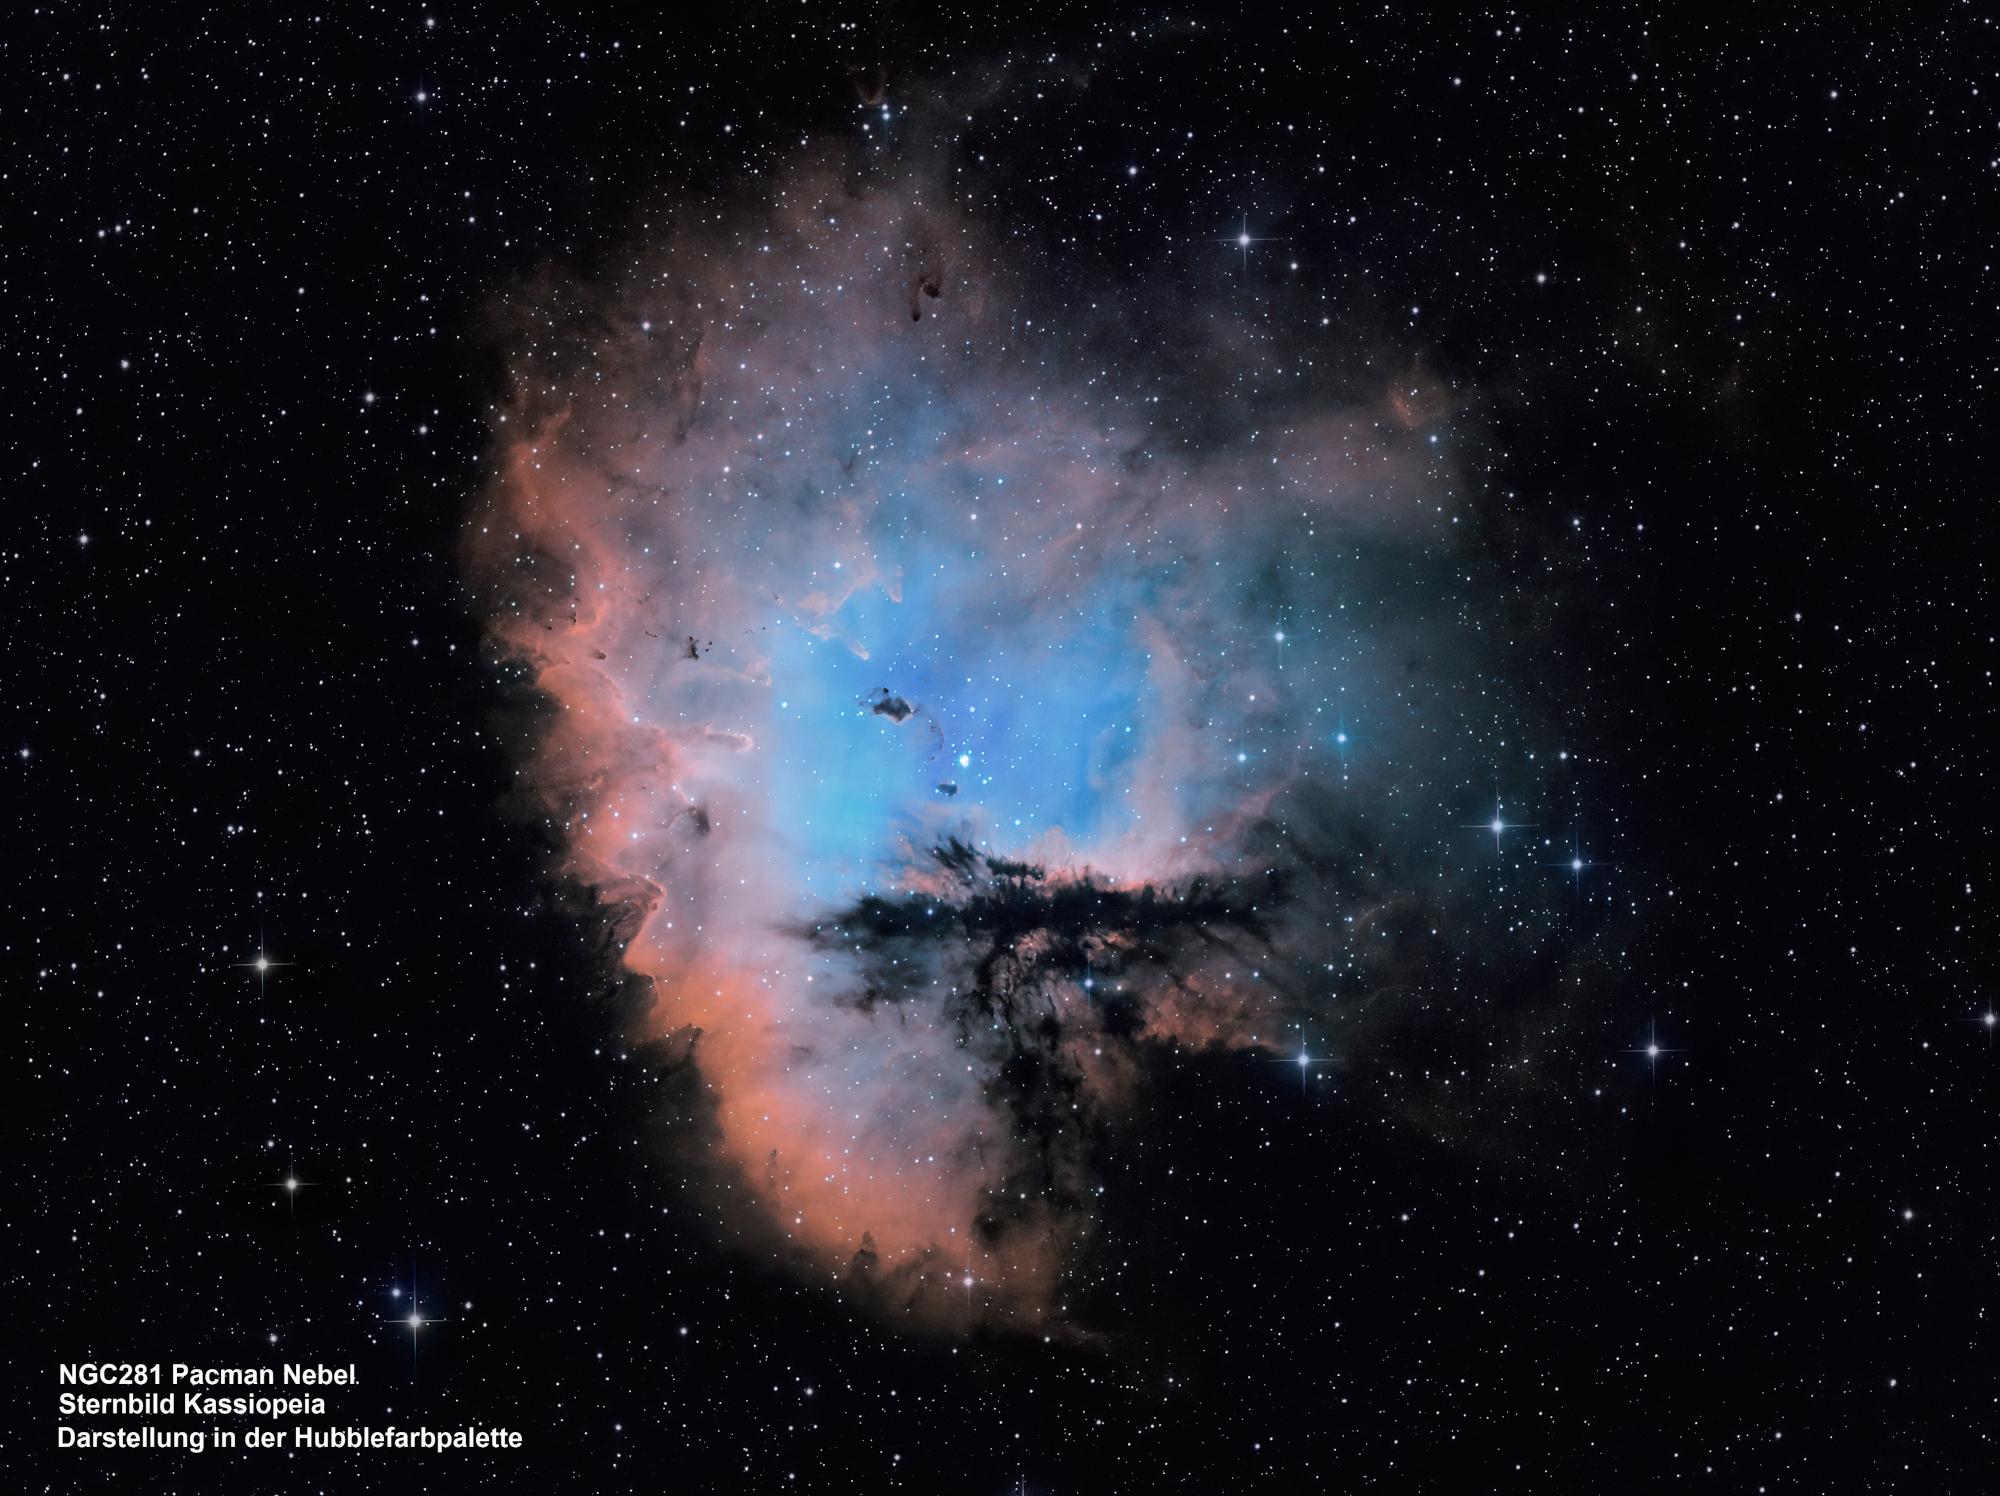 NGC281 Pacman-Nebel (Hubble-Farbpalette)